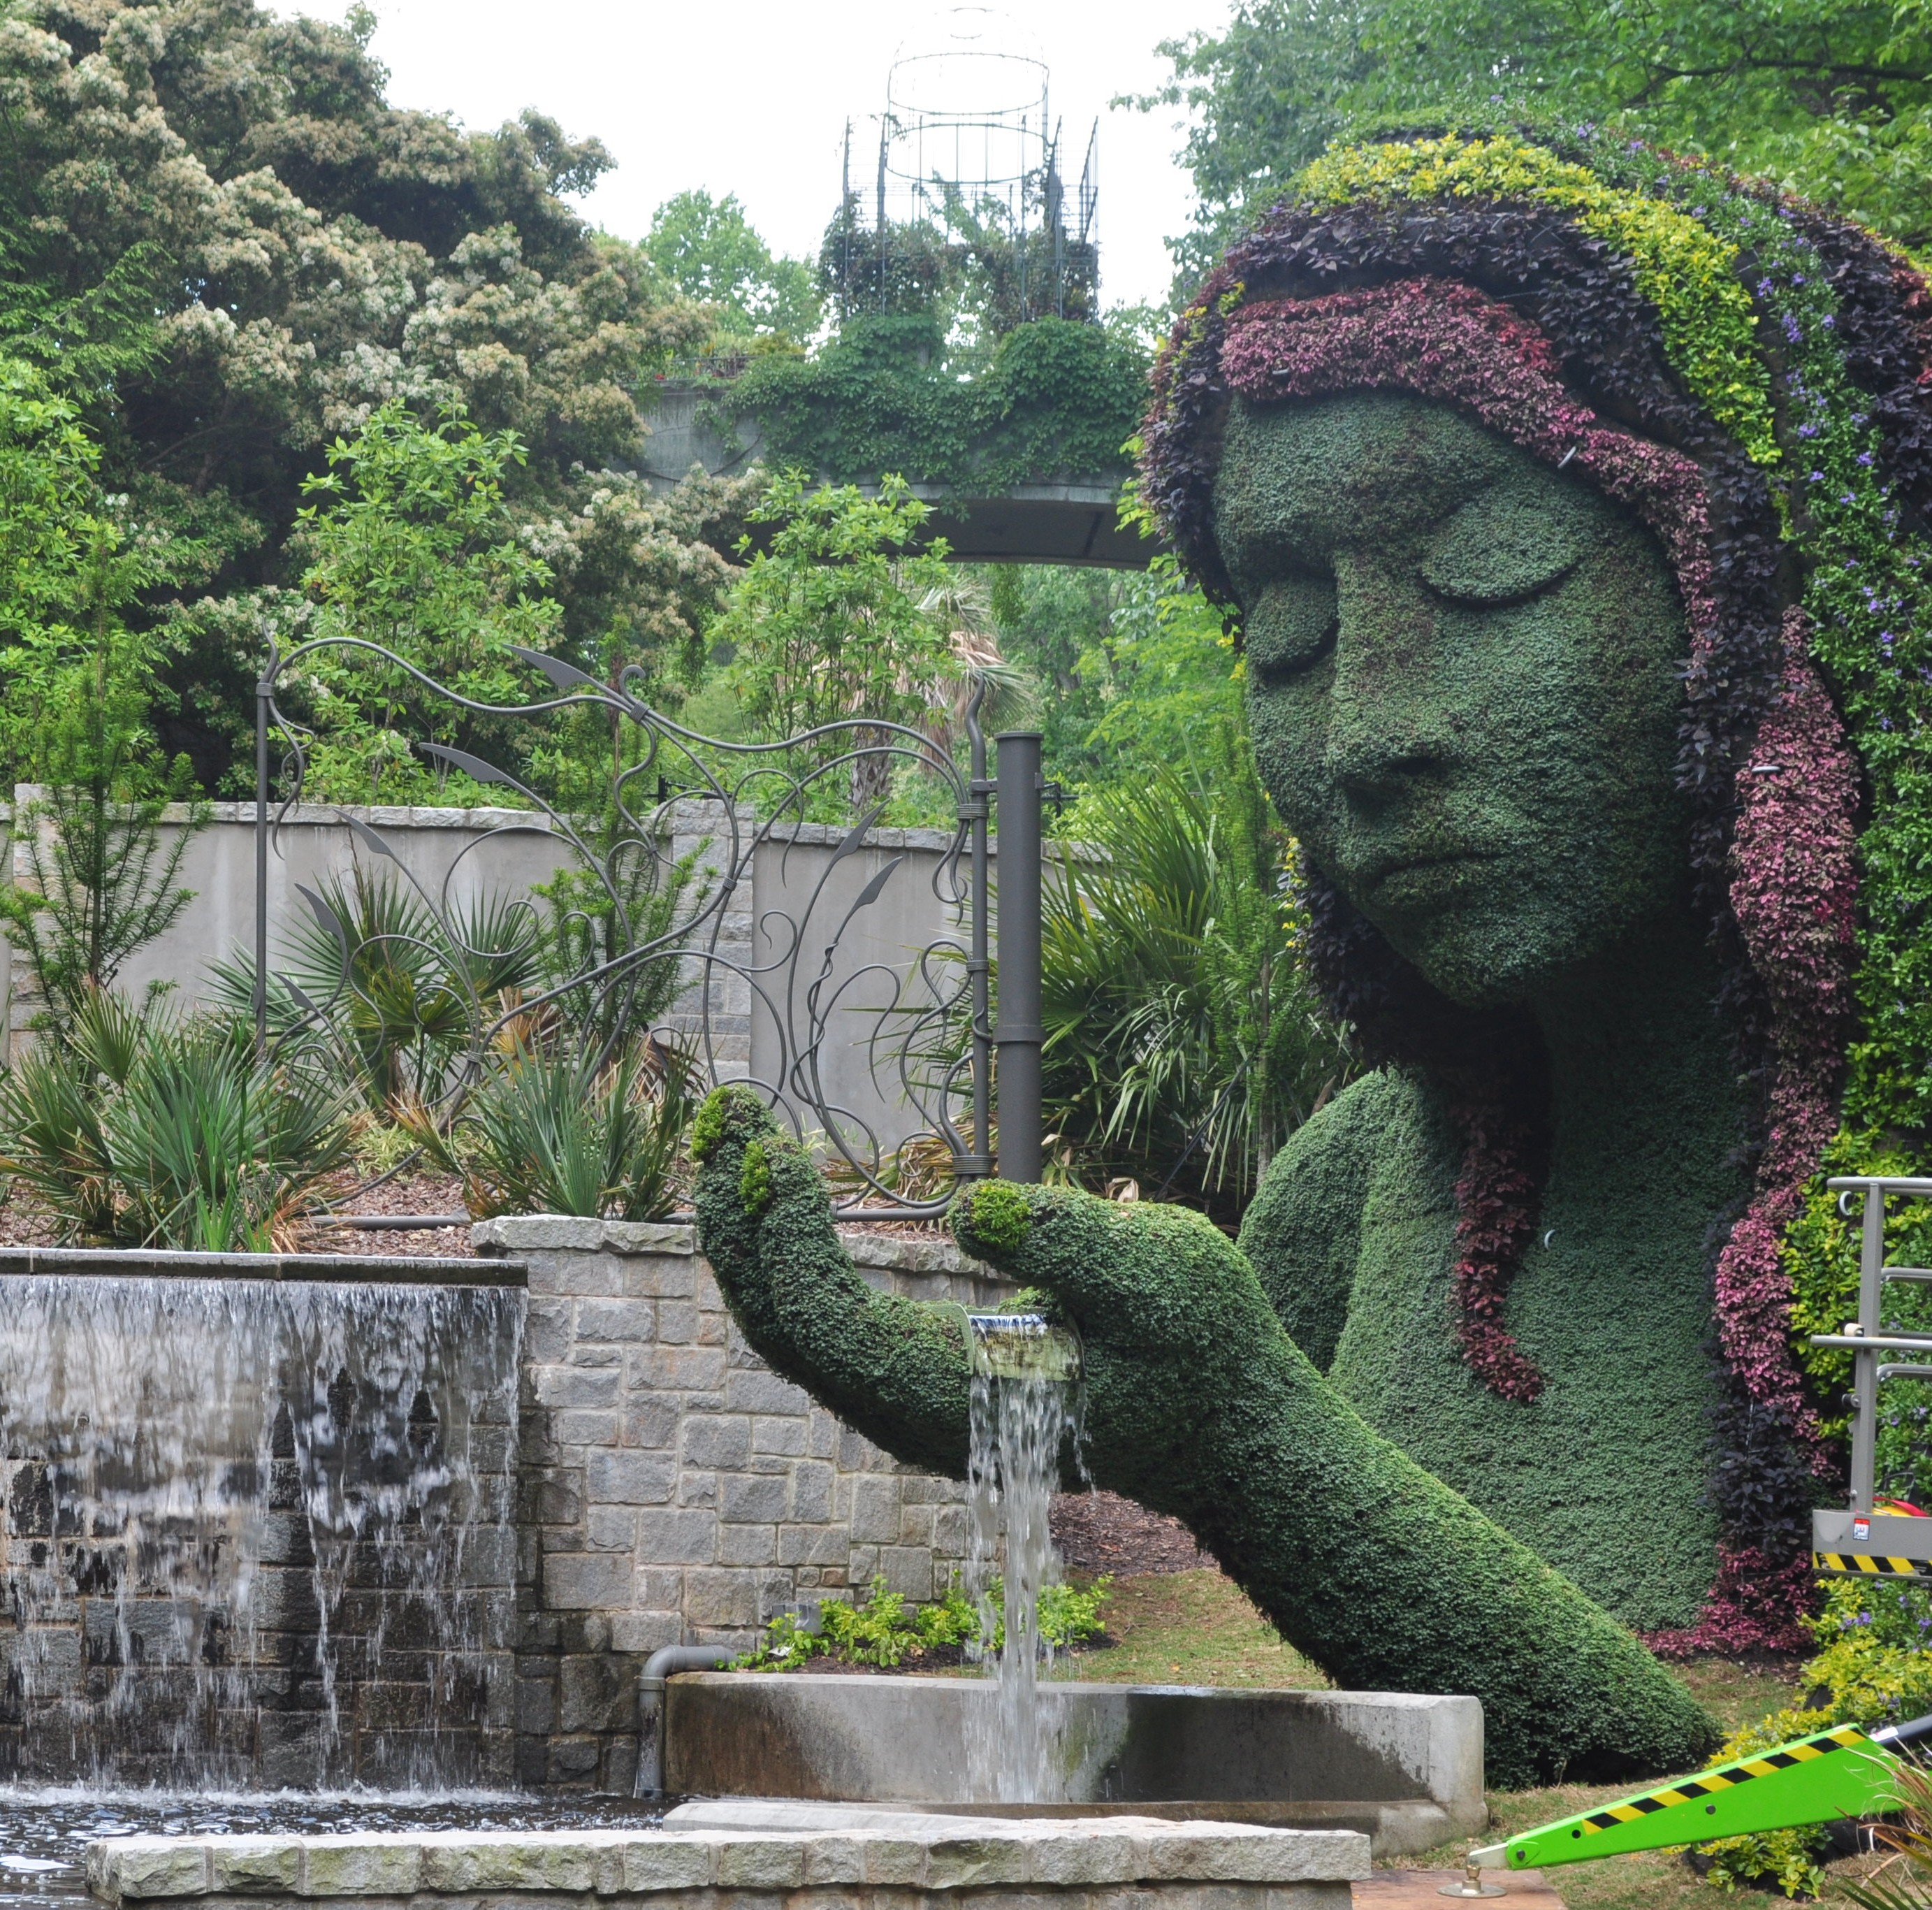 Lyle lovett atlanta botanical garden garden ftempo - Atlanta botanical garden membership ...